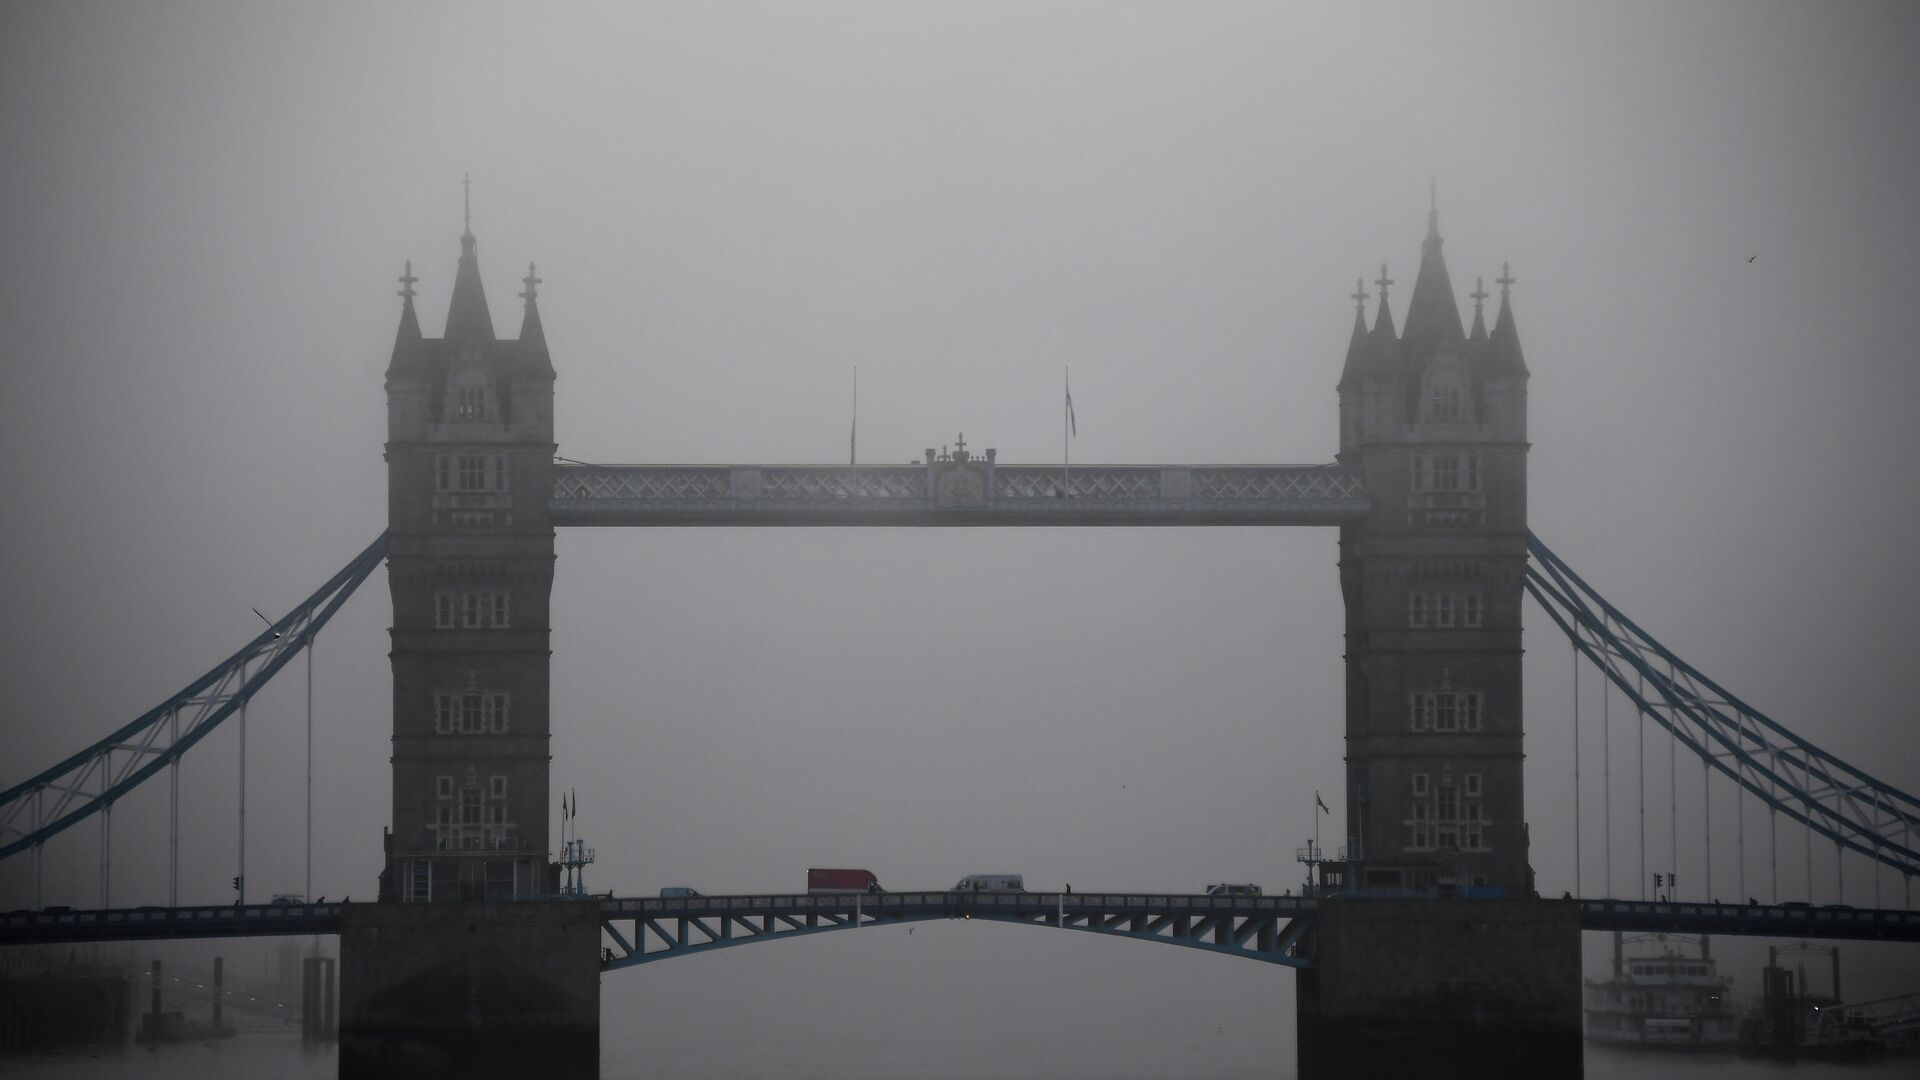 Вид на Тауэрский мост в Лондоне - РИА Новости, 1920, 17.01.2021